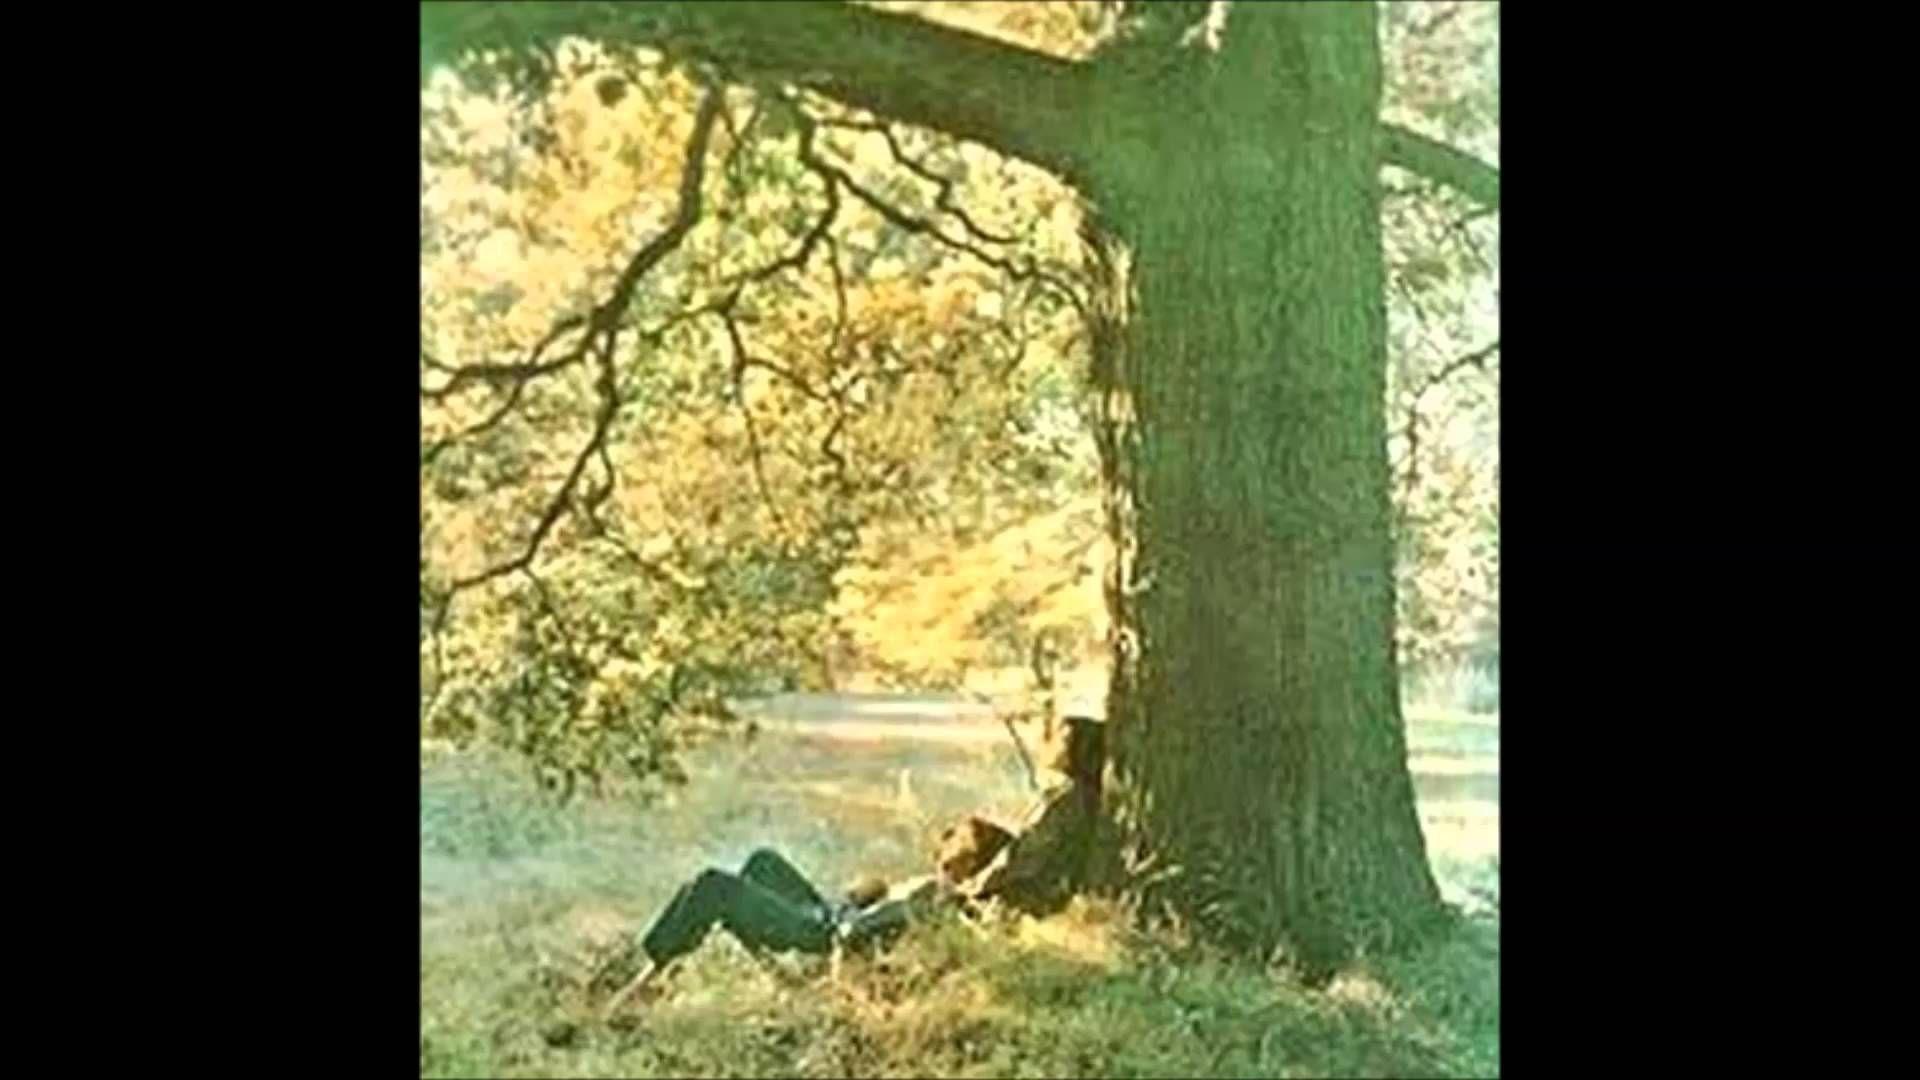 John Lennon - Plastic Ono Band album